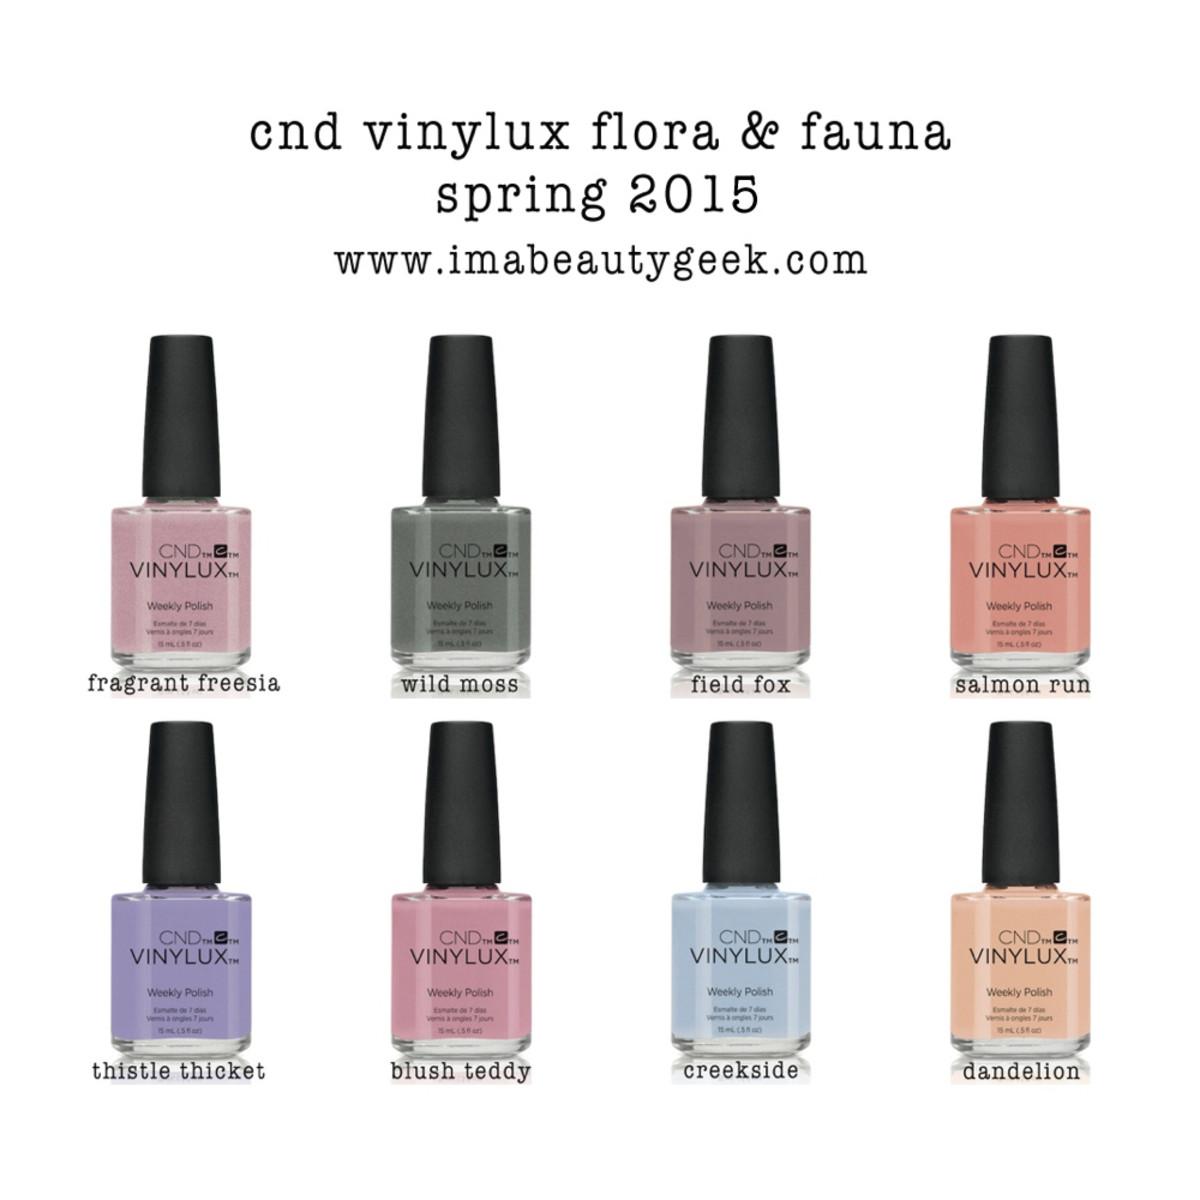 CND Vinylux Flora & Fauna Collection Spring 2015